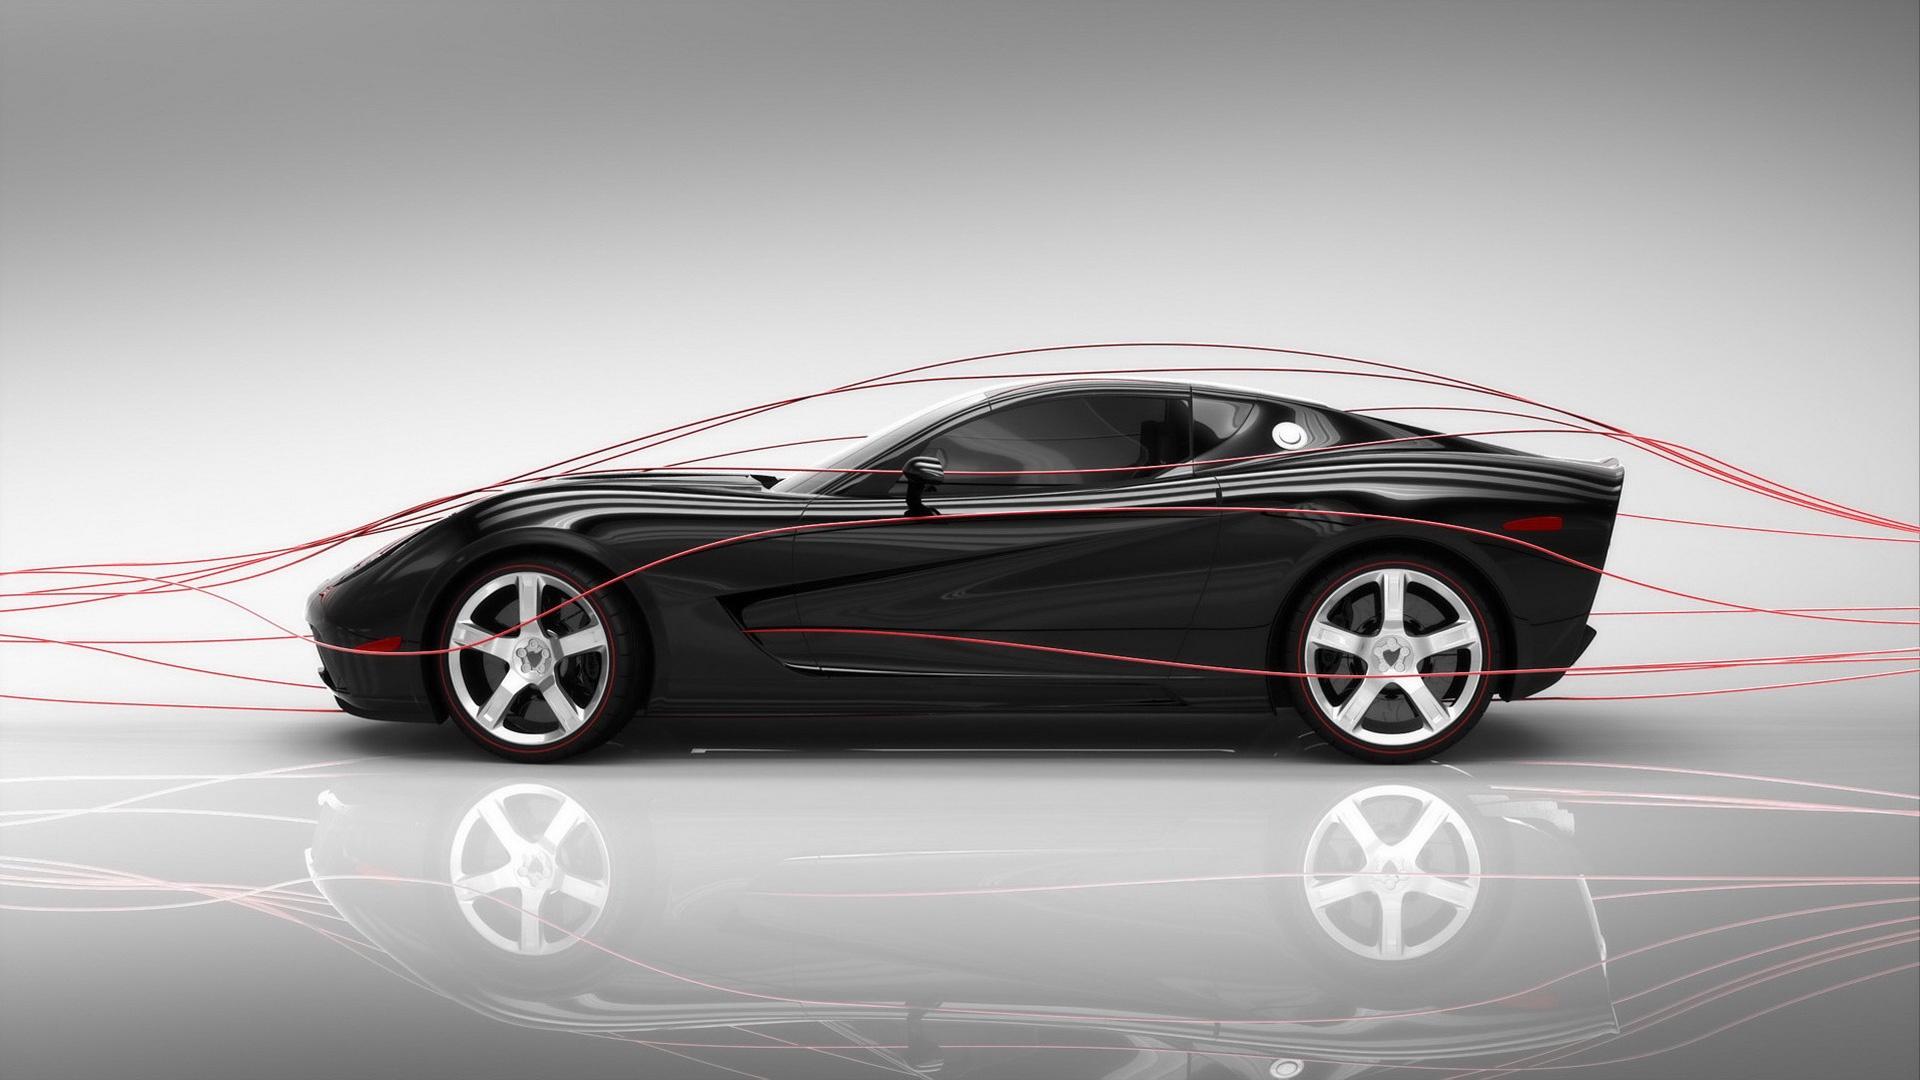 Corvette Mallett Super Car Wallpapers In Jpg Format For Free Download